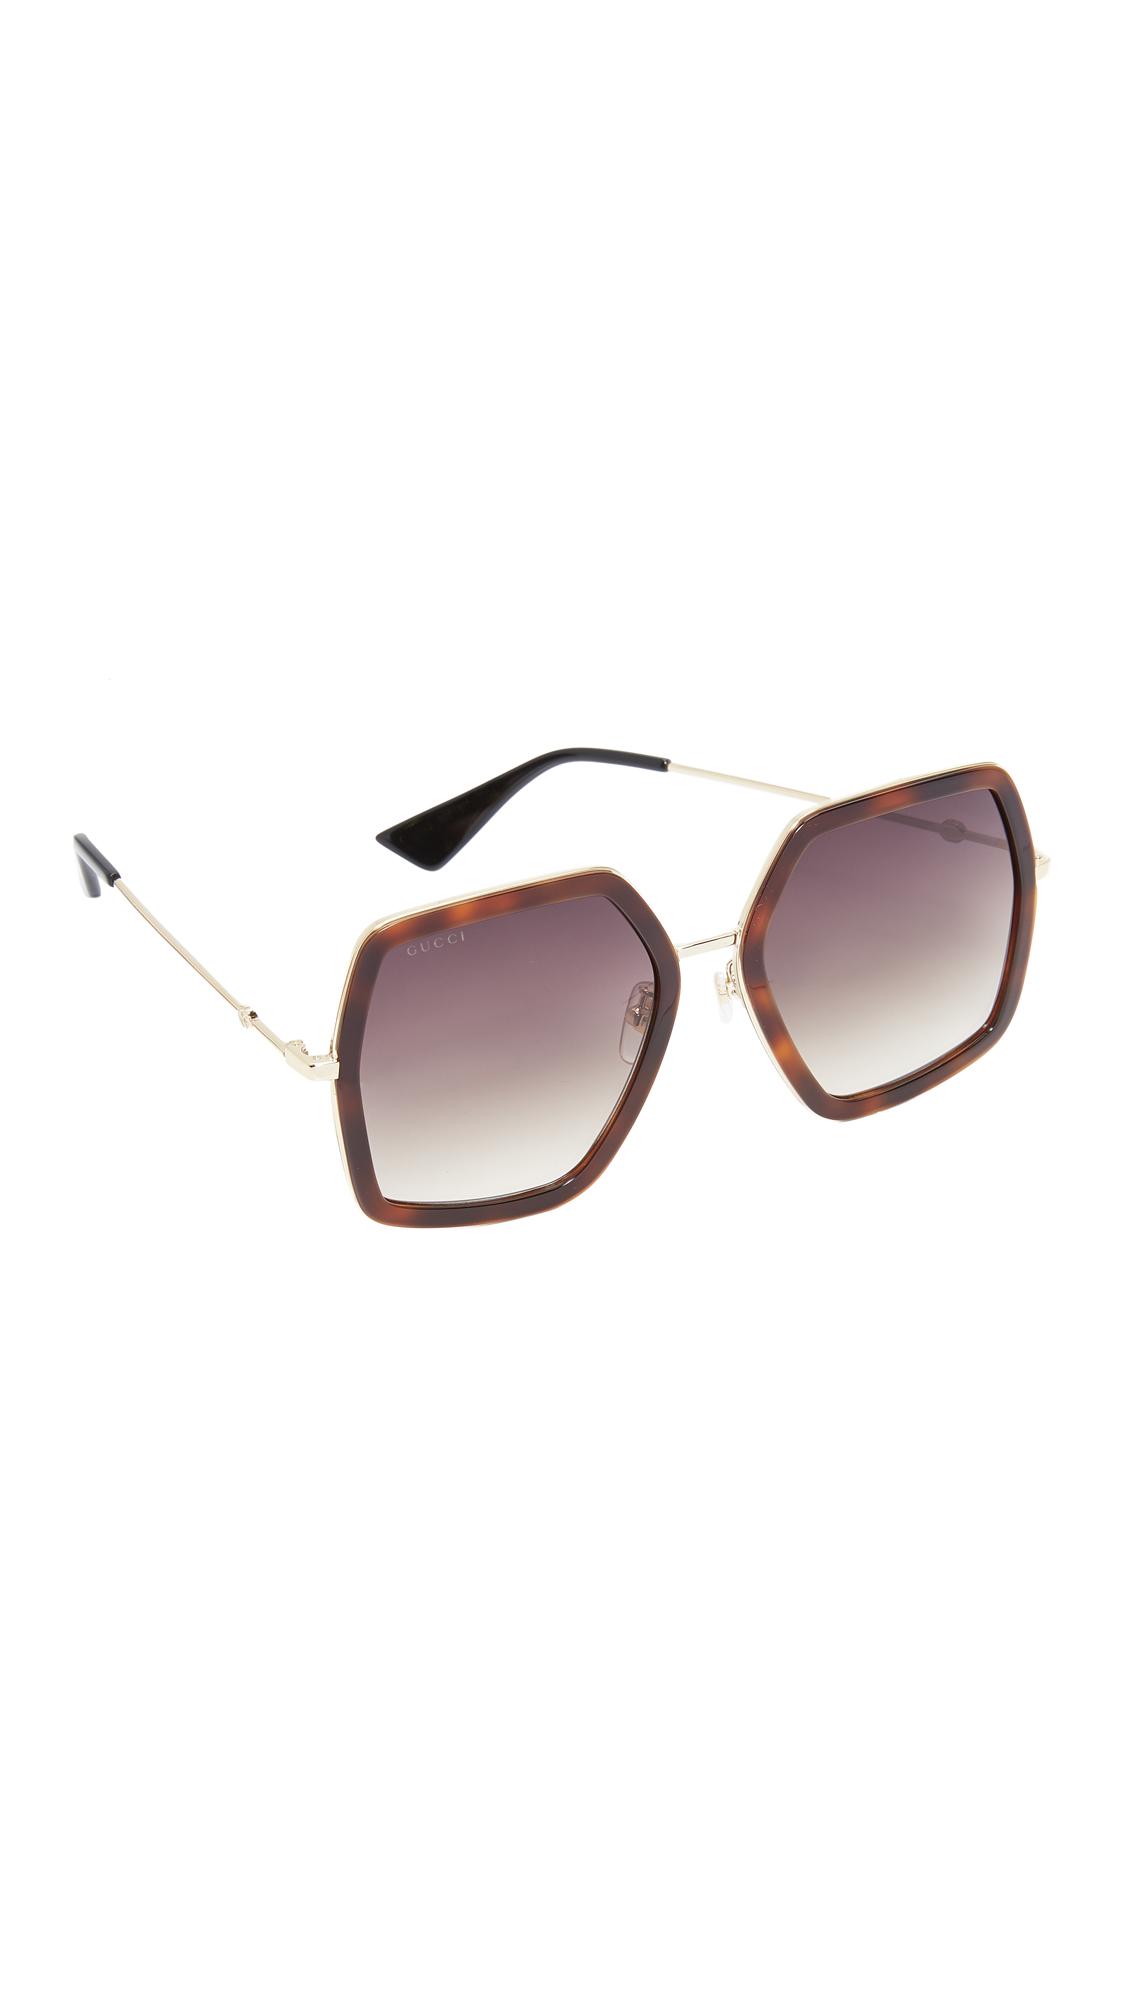 Gucci Urban Web Block Sunglasses - Havana/Brown